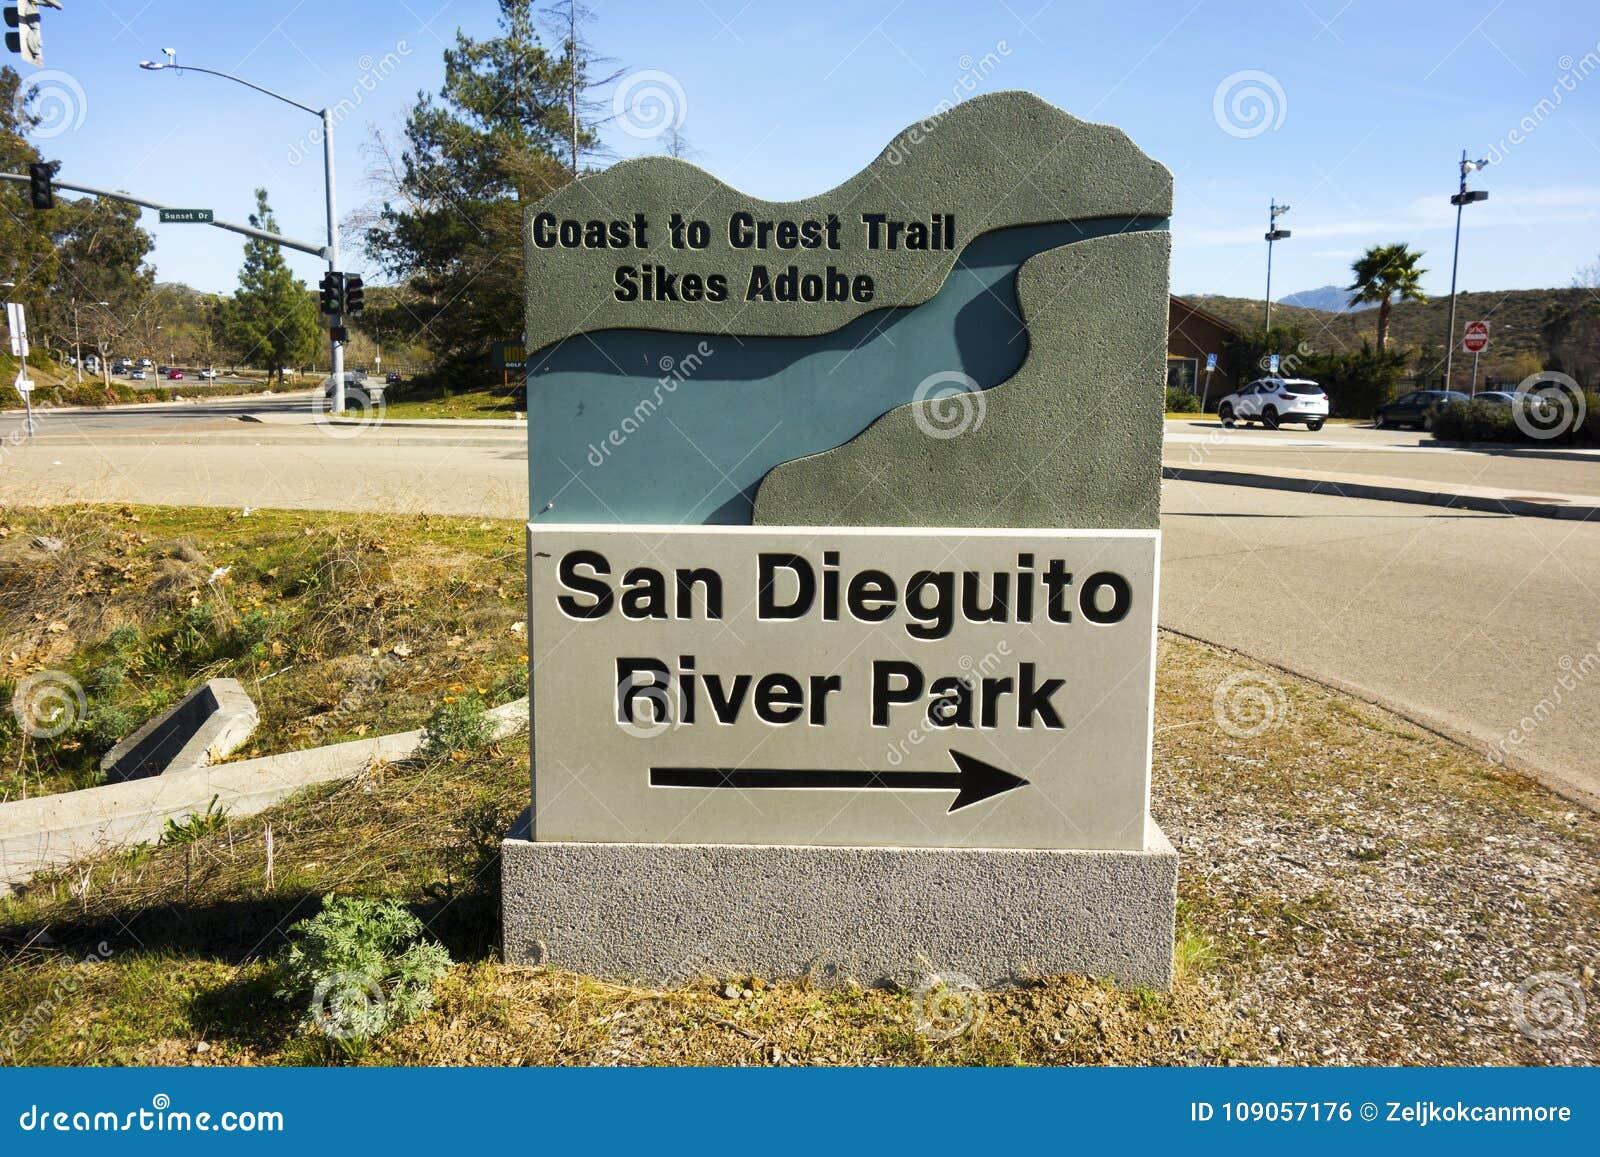 San Dieguito River Park Entrance Table Information Sign